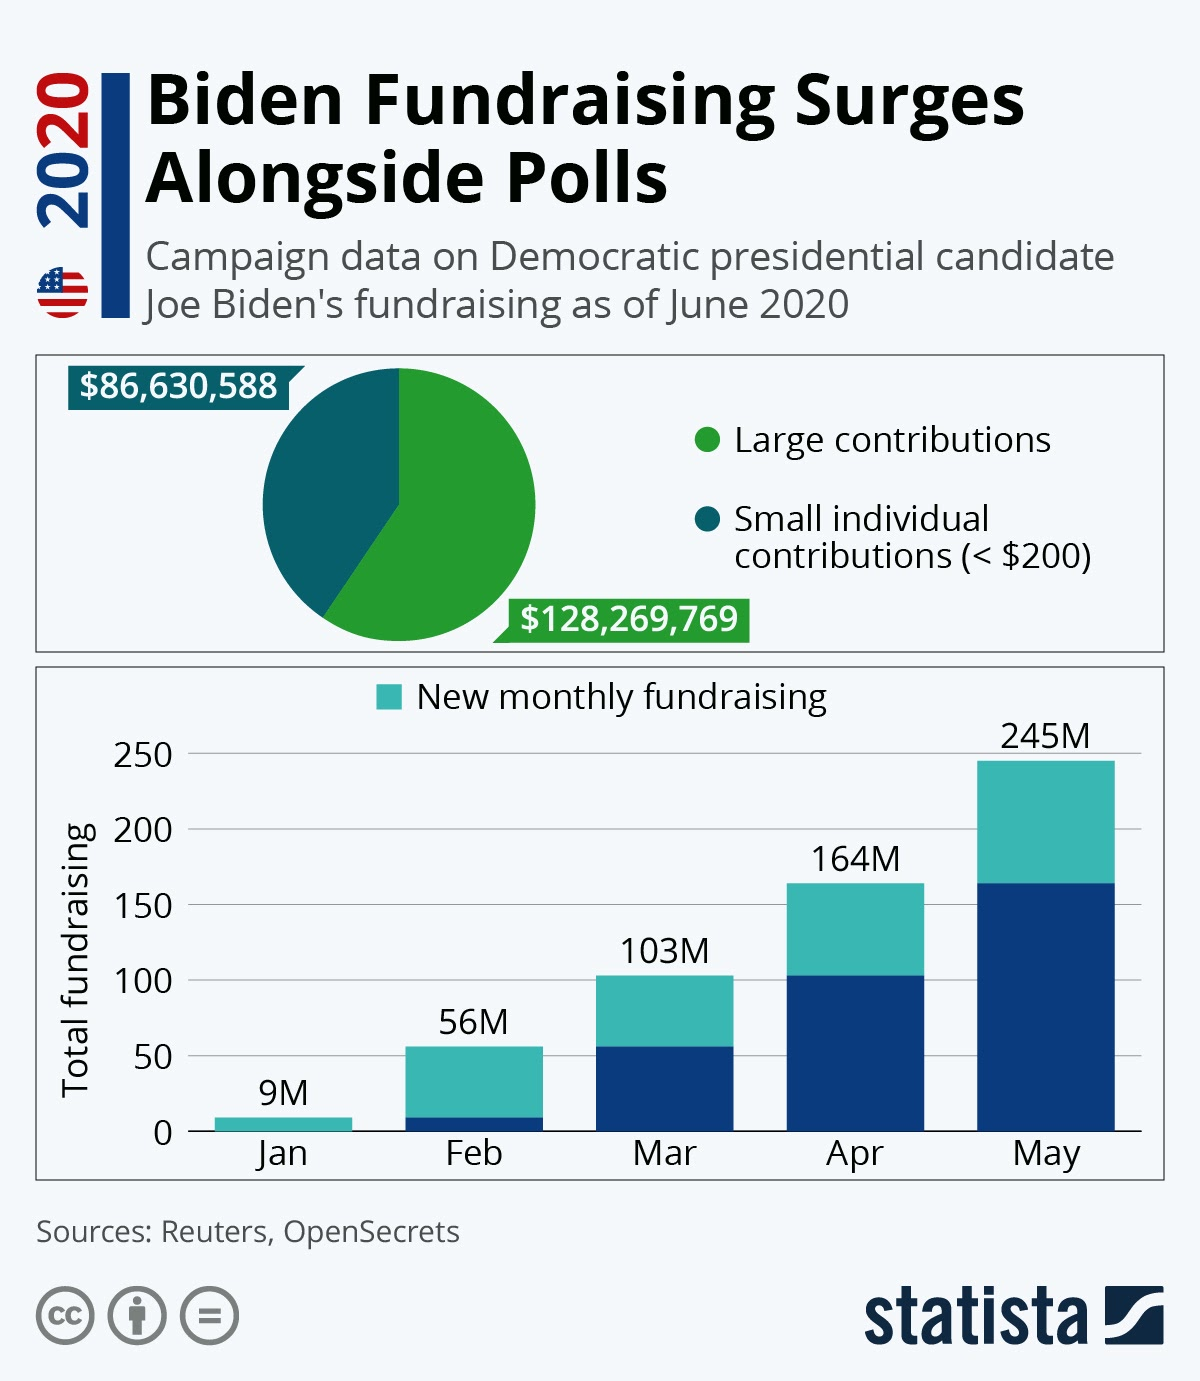 Biden Fundraising Surges Alongside Polls #infographic